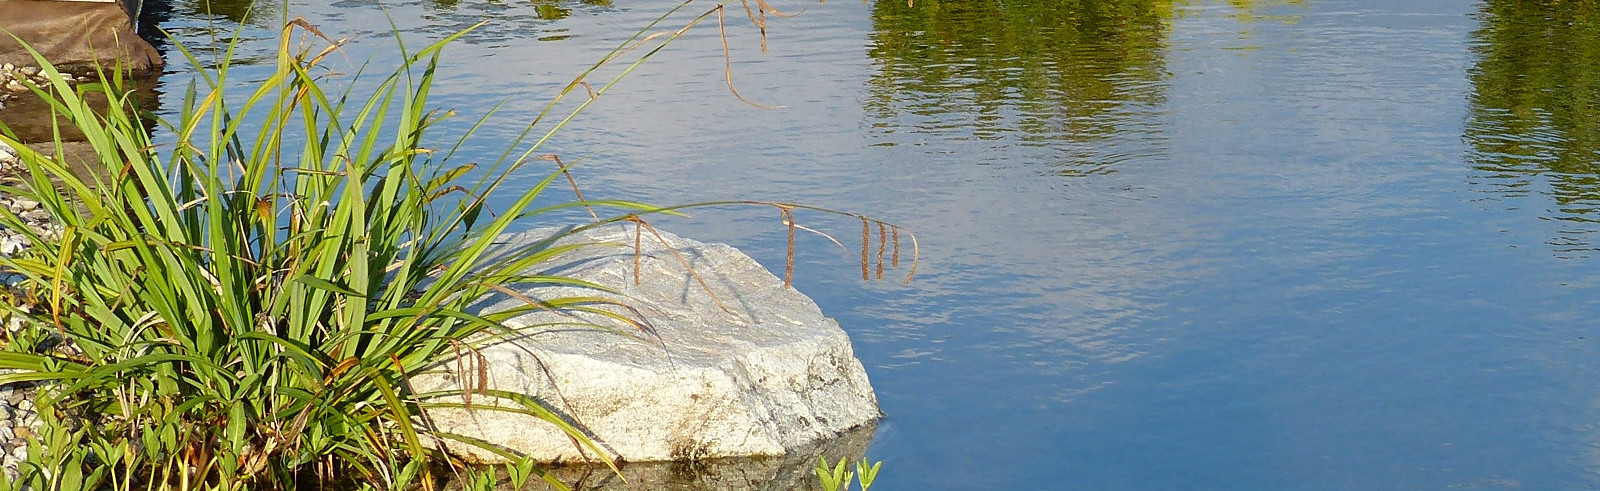 Teich Sana e Salva